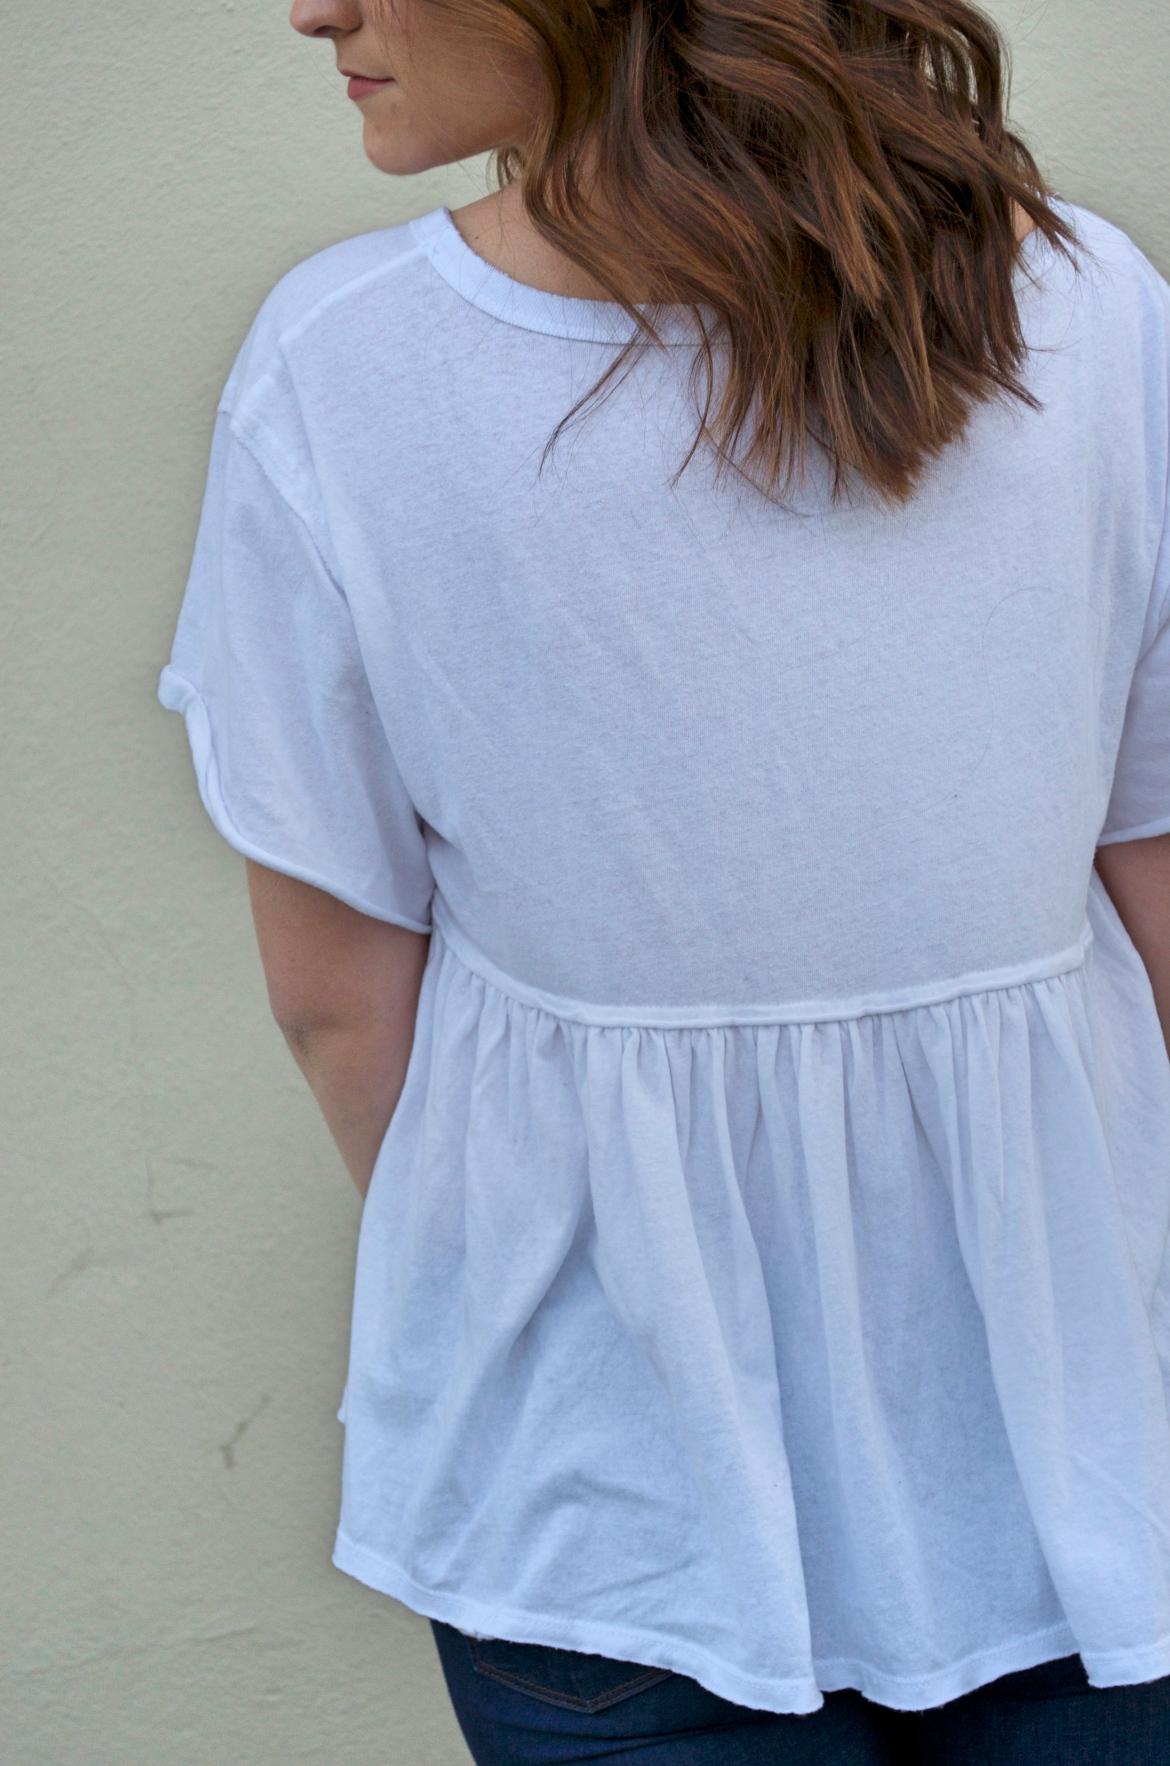 back-of-shirt